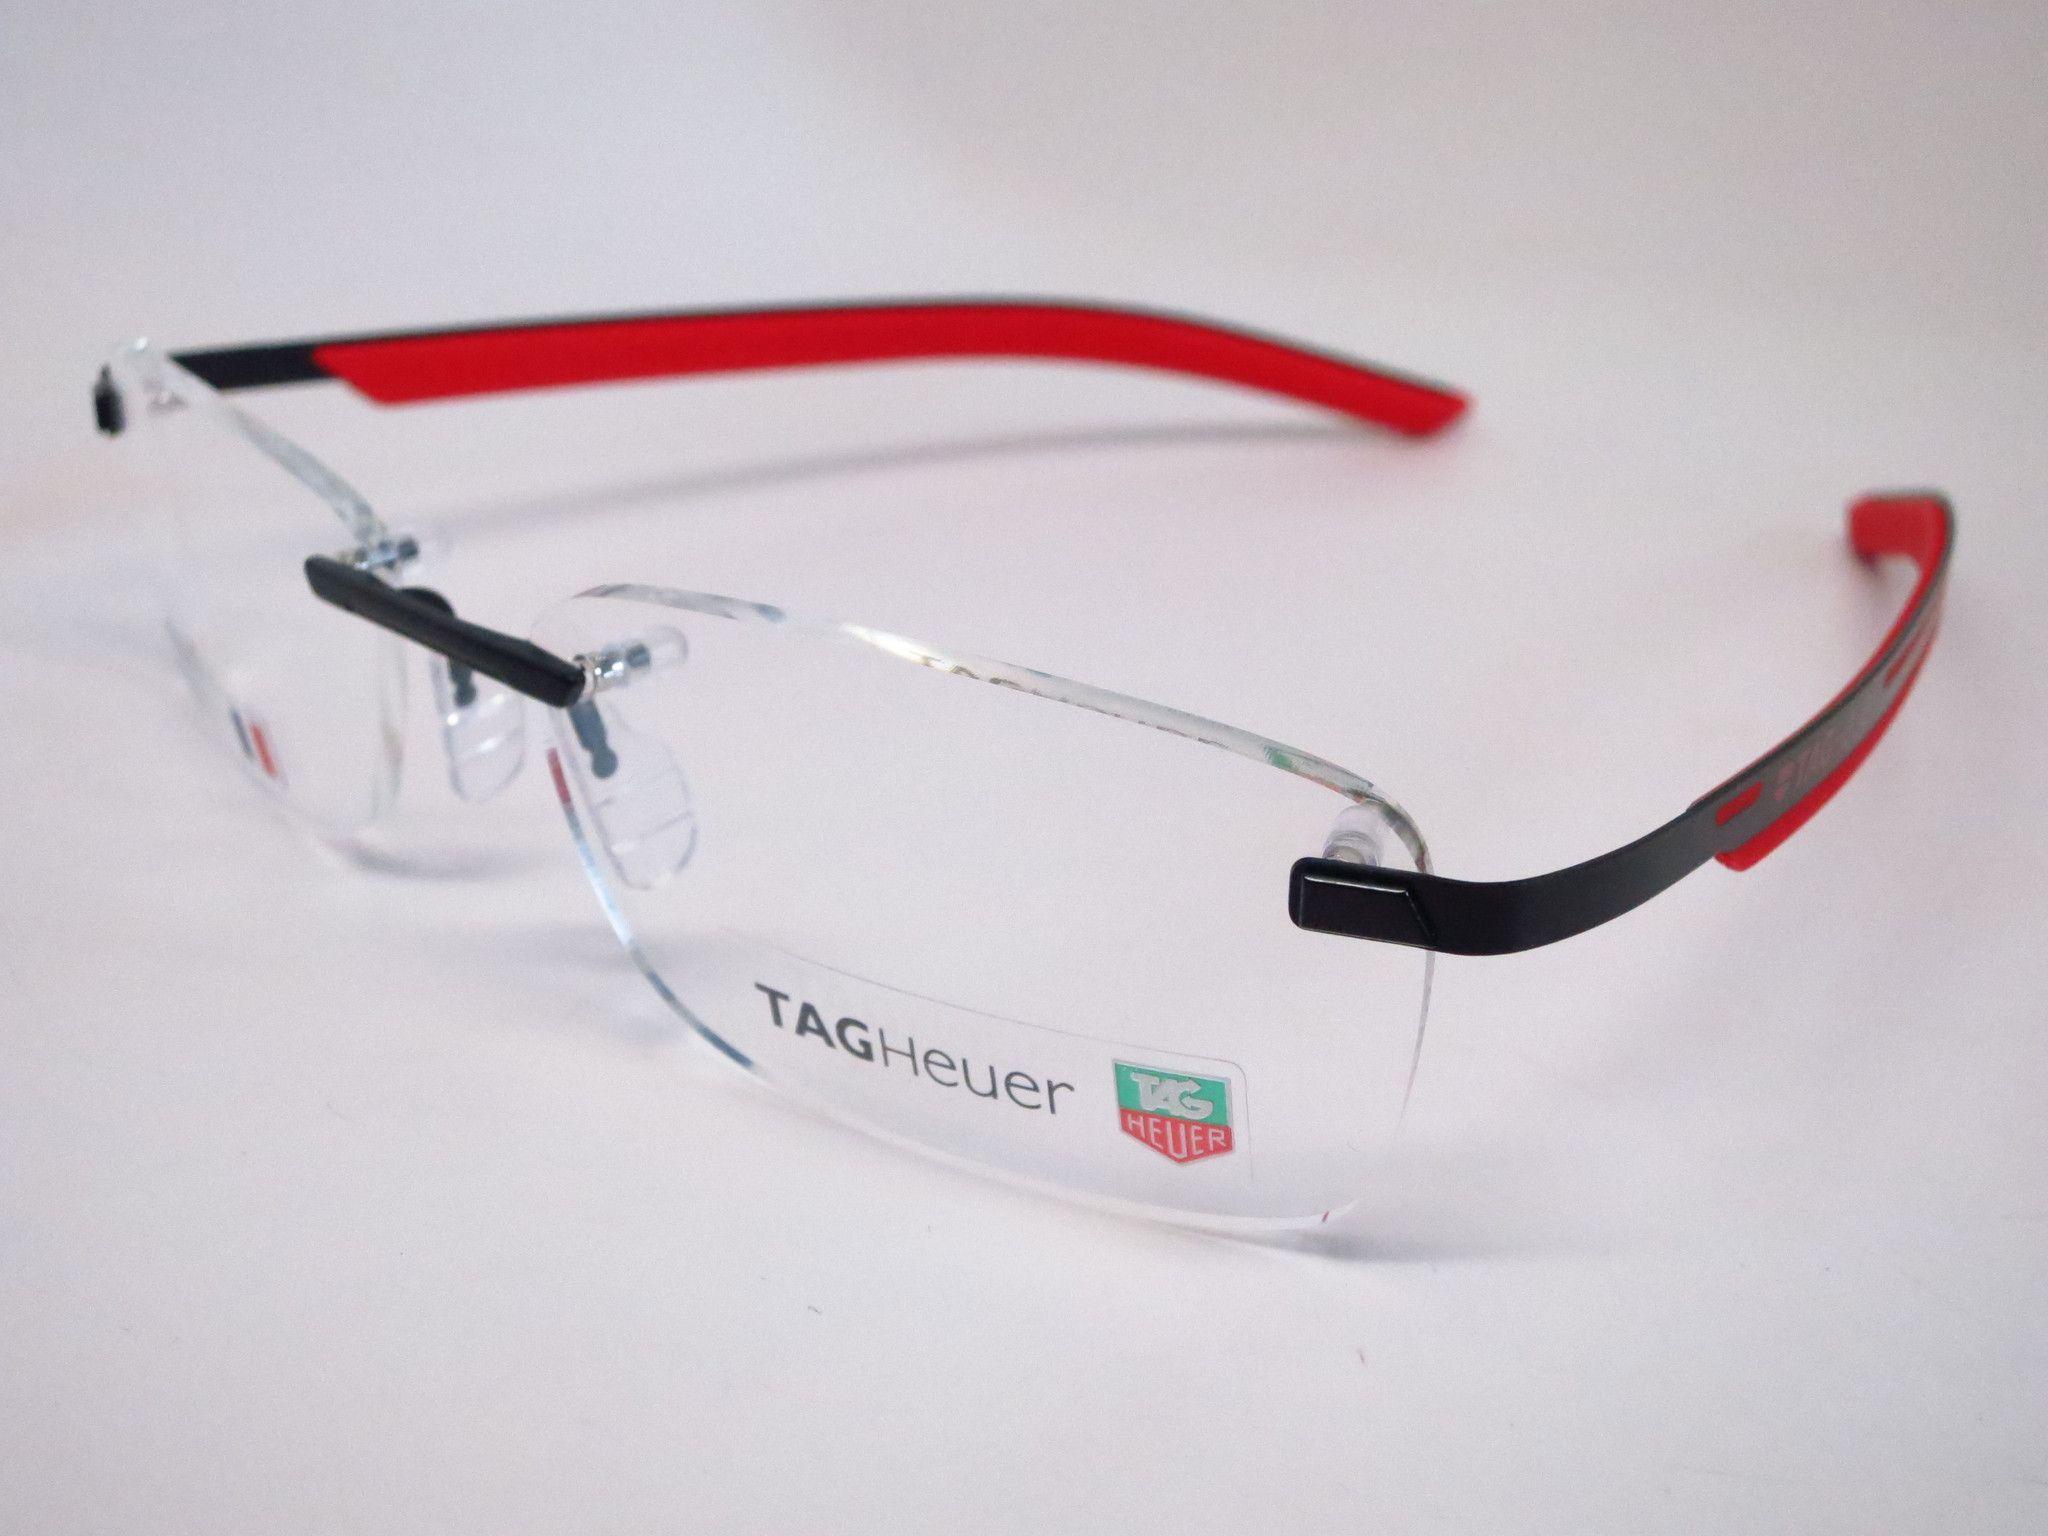 0c3f7930ef4 Tag Heuer TH 3843 002 Red   Black Line Rimless Eyeglasses